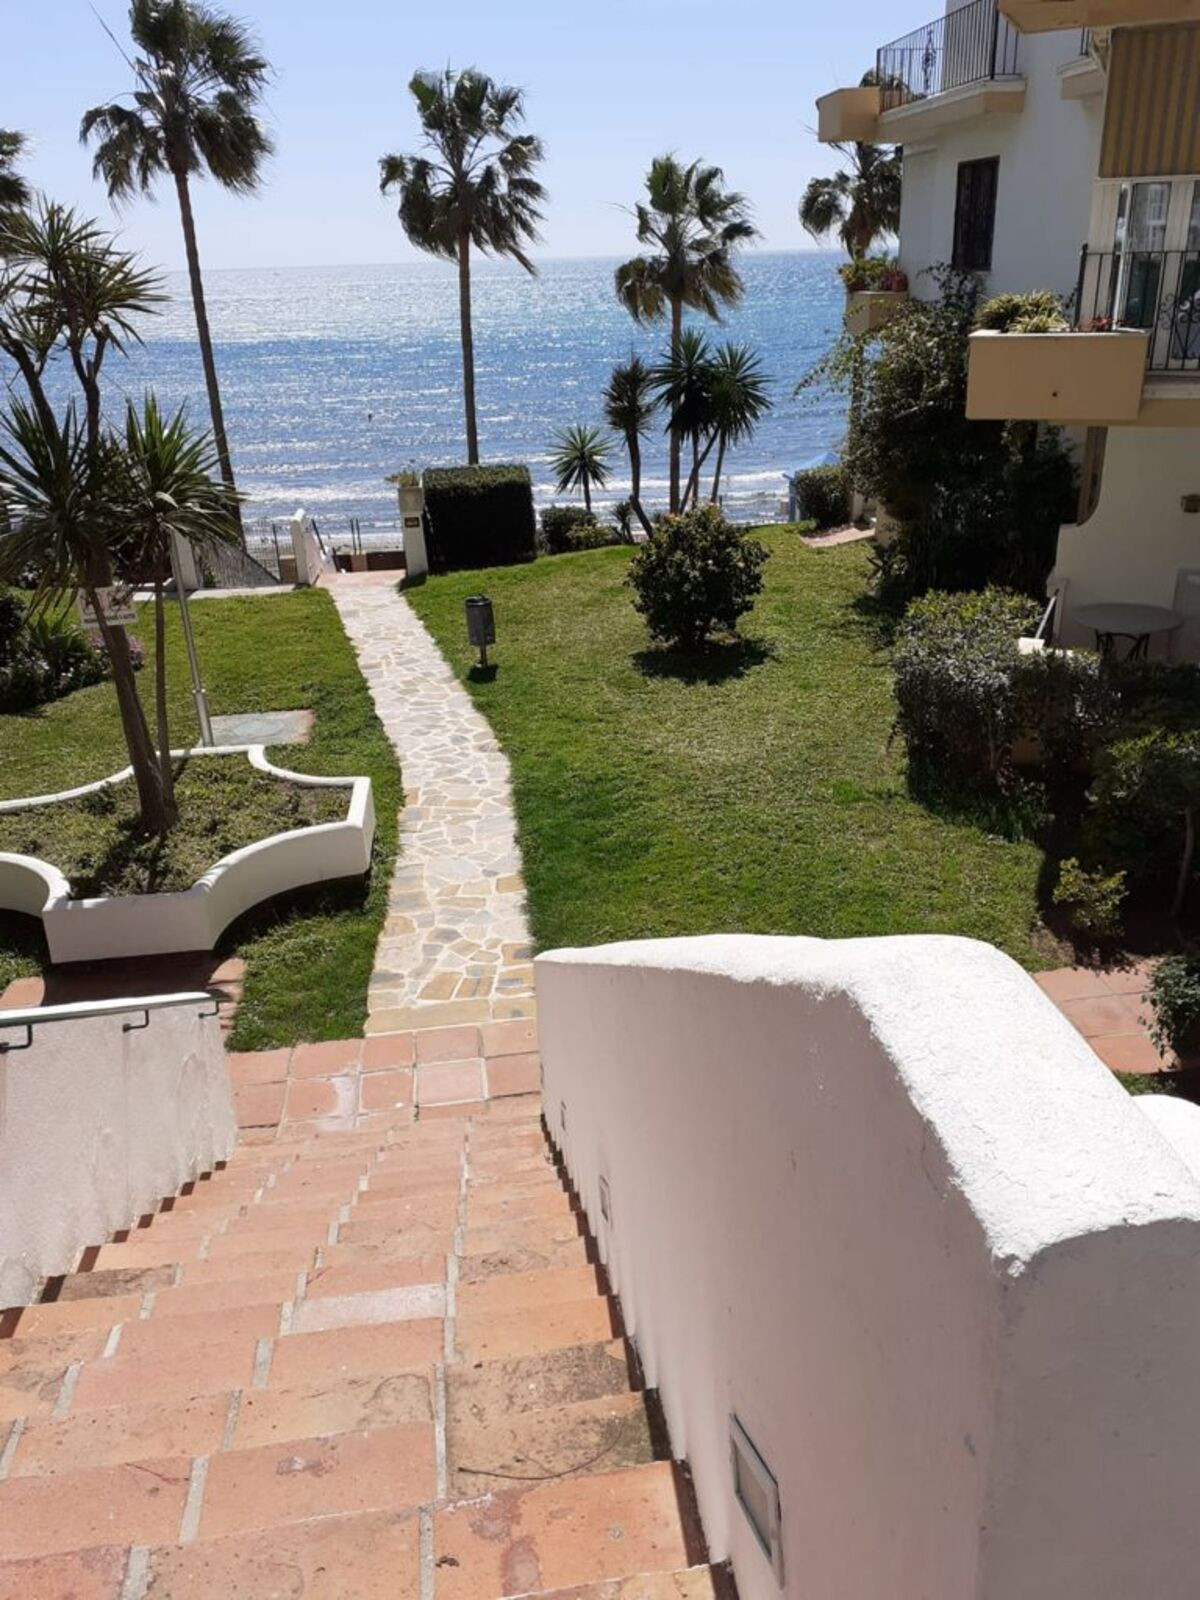 Frontline beach urbanisation in Marbella del Mar on playa la bajadilla, near the quiron hospital to ,Spain